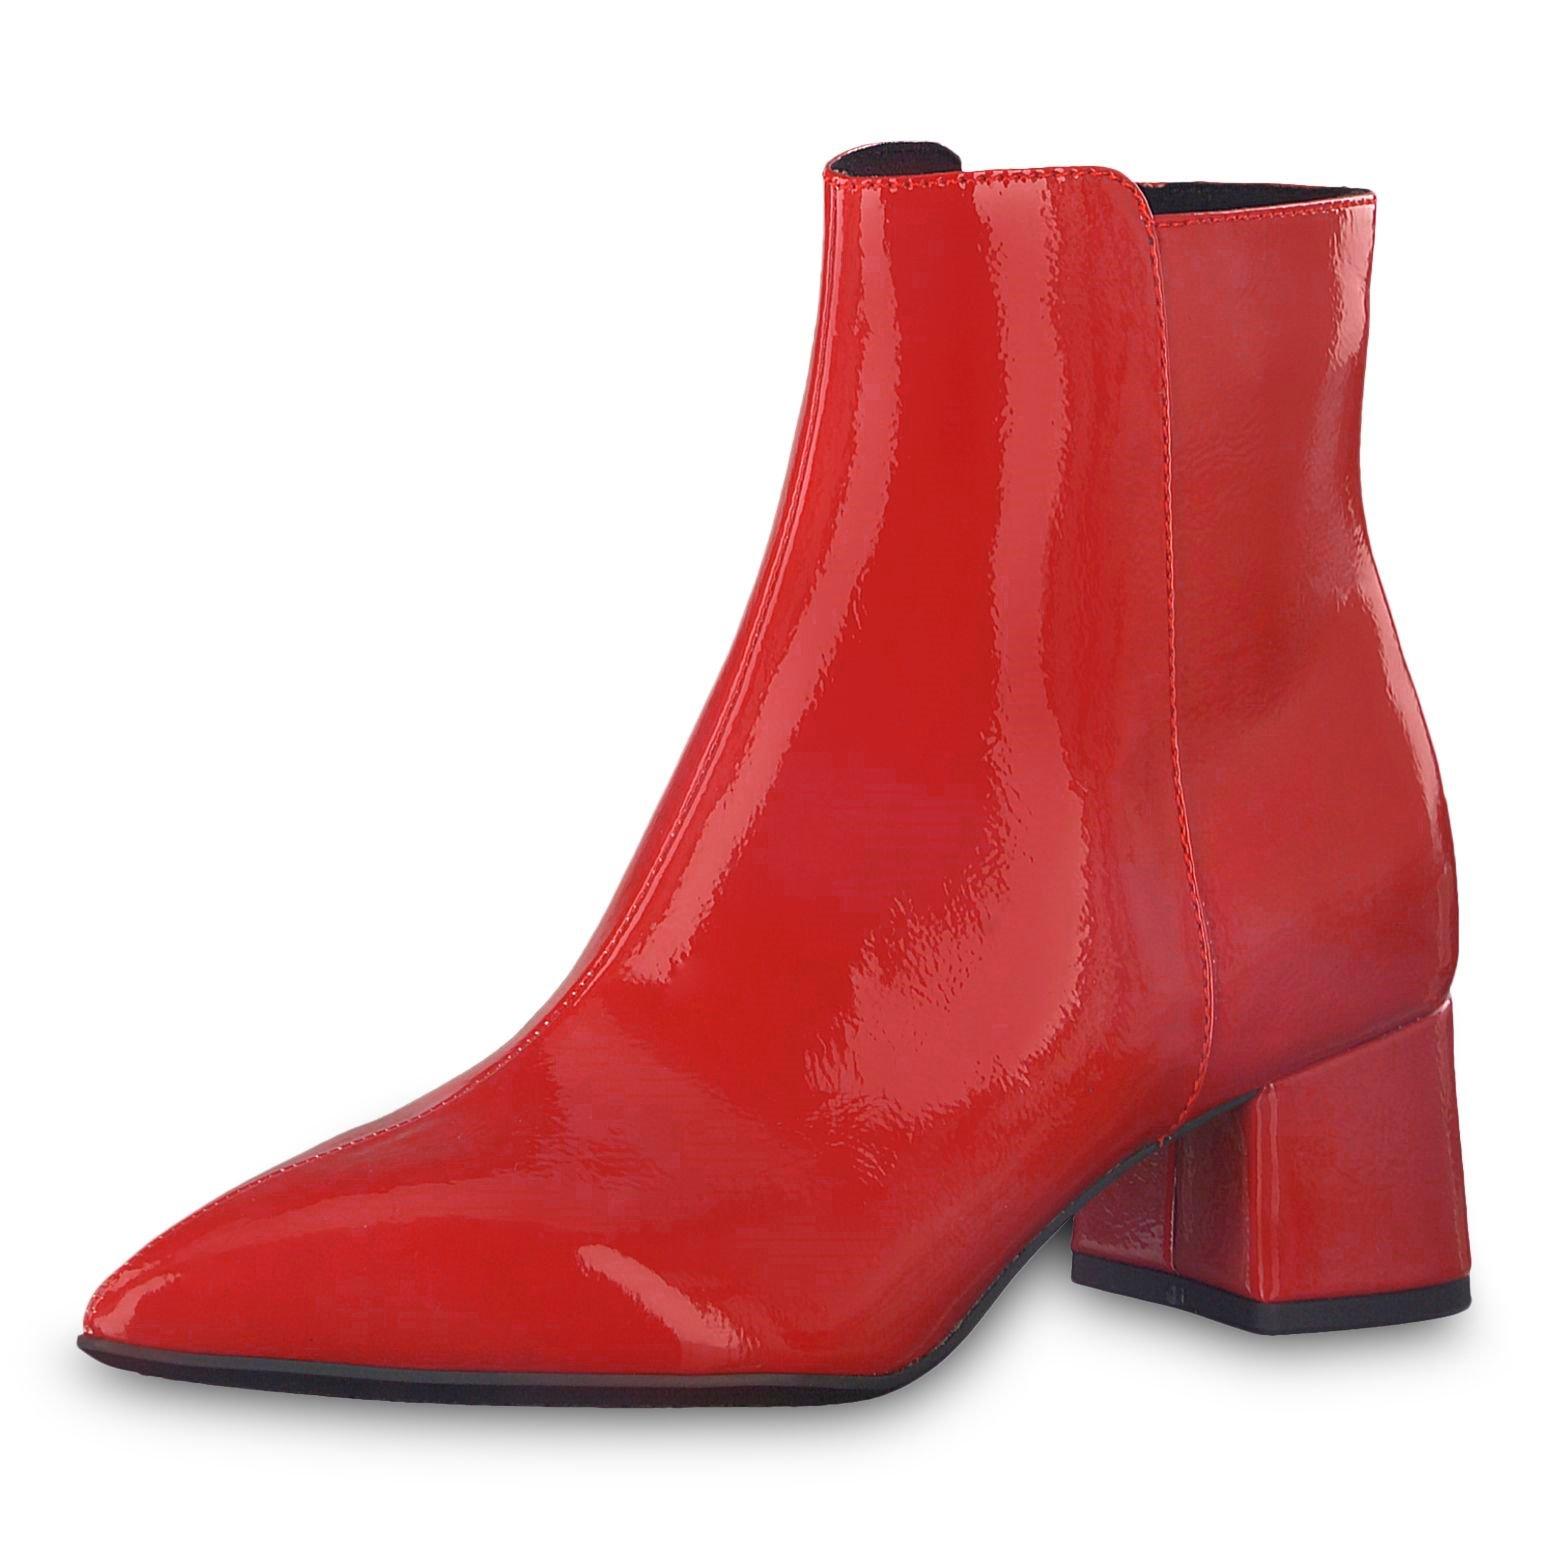 Støvle fra Tamaris